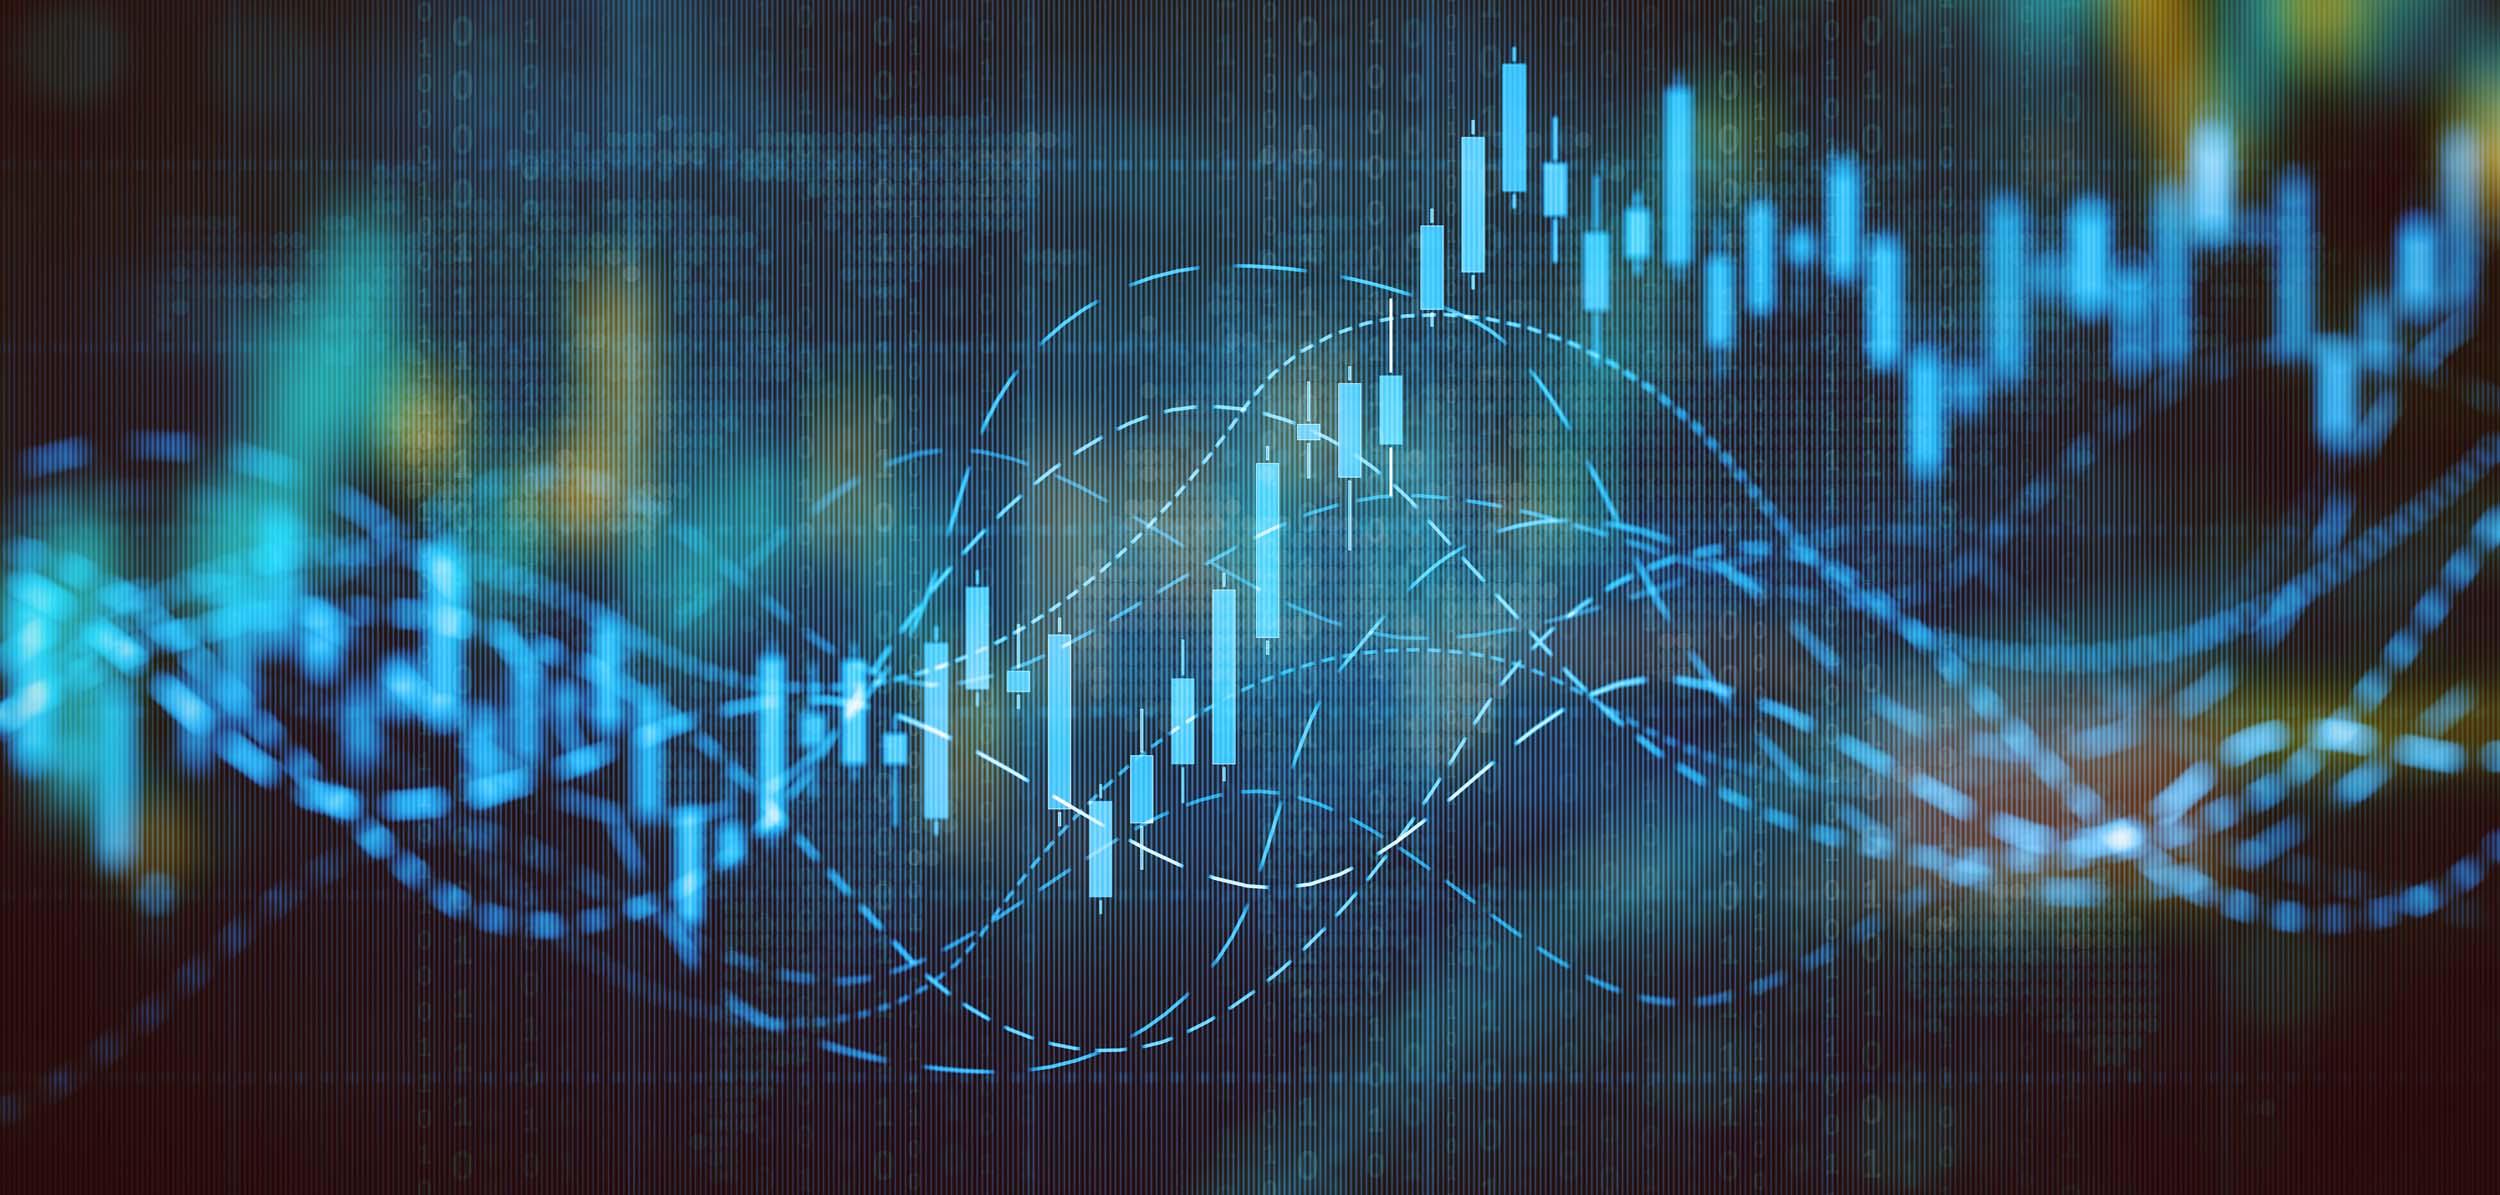 Dragonfly-Strategists-Revenue-Charts.jpg